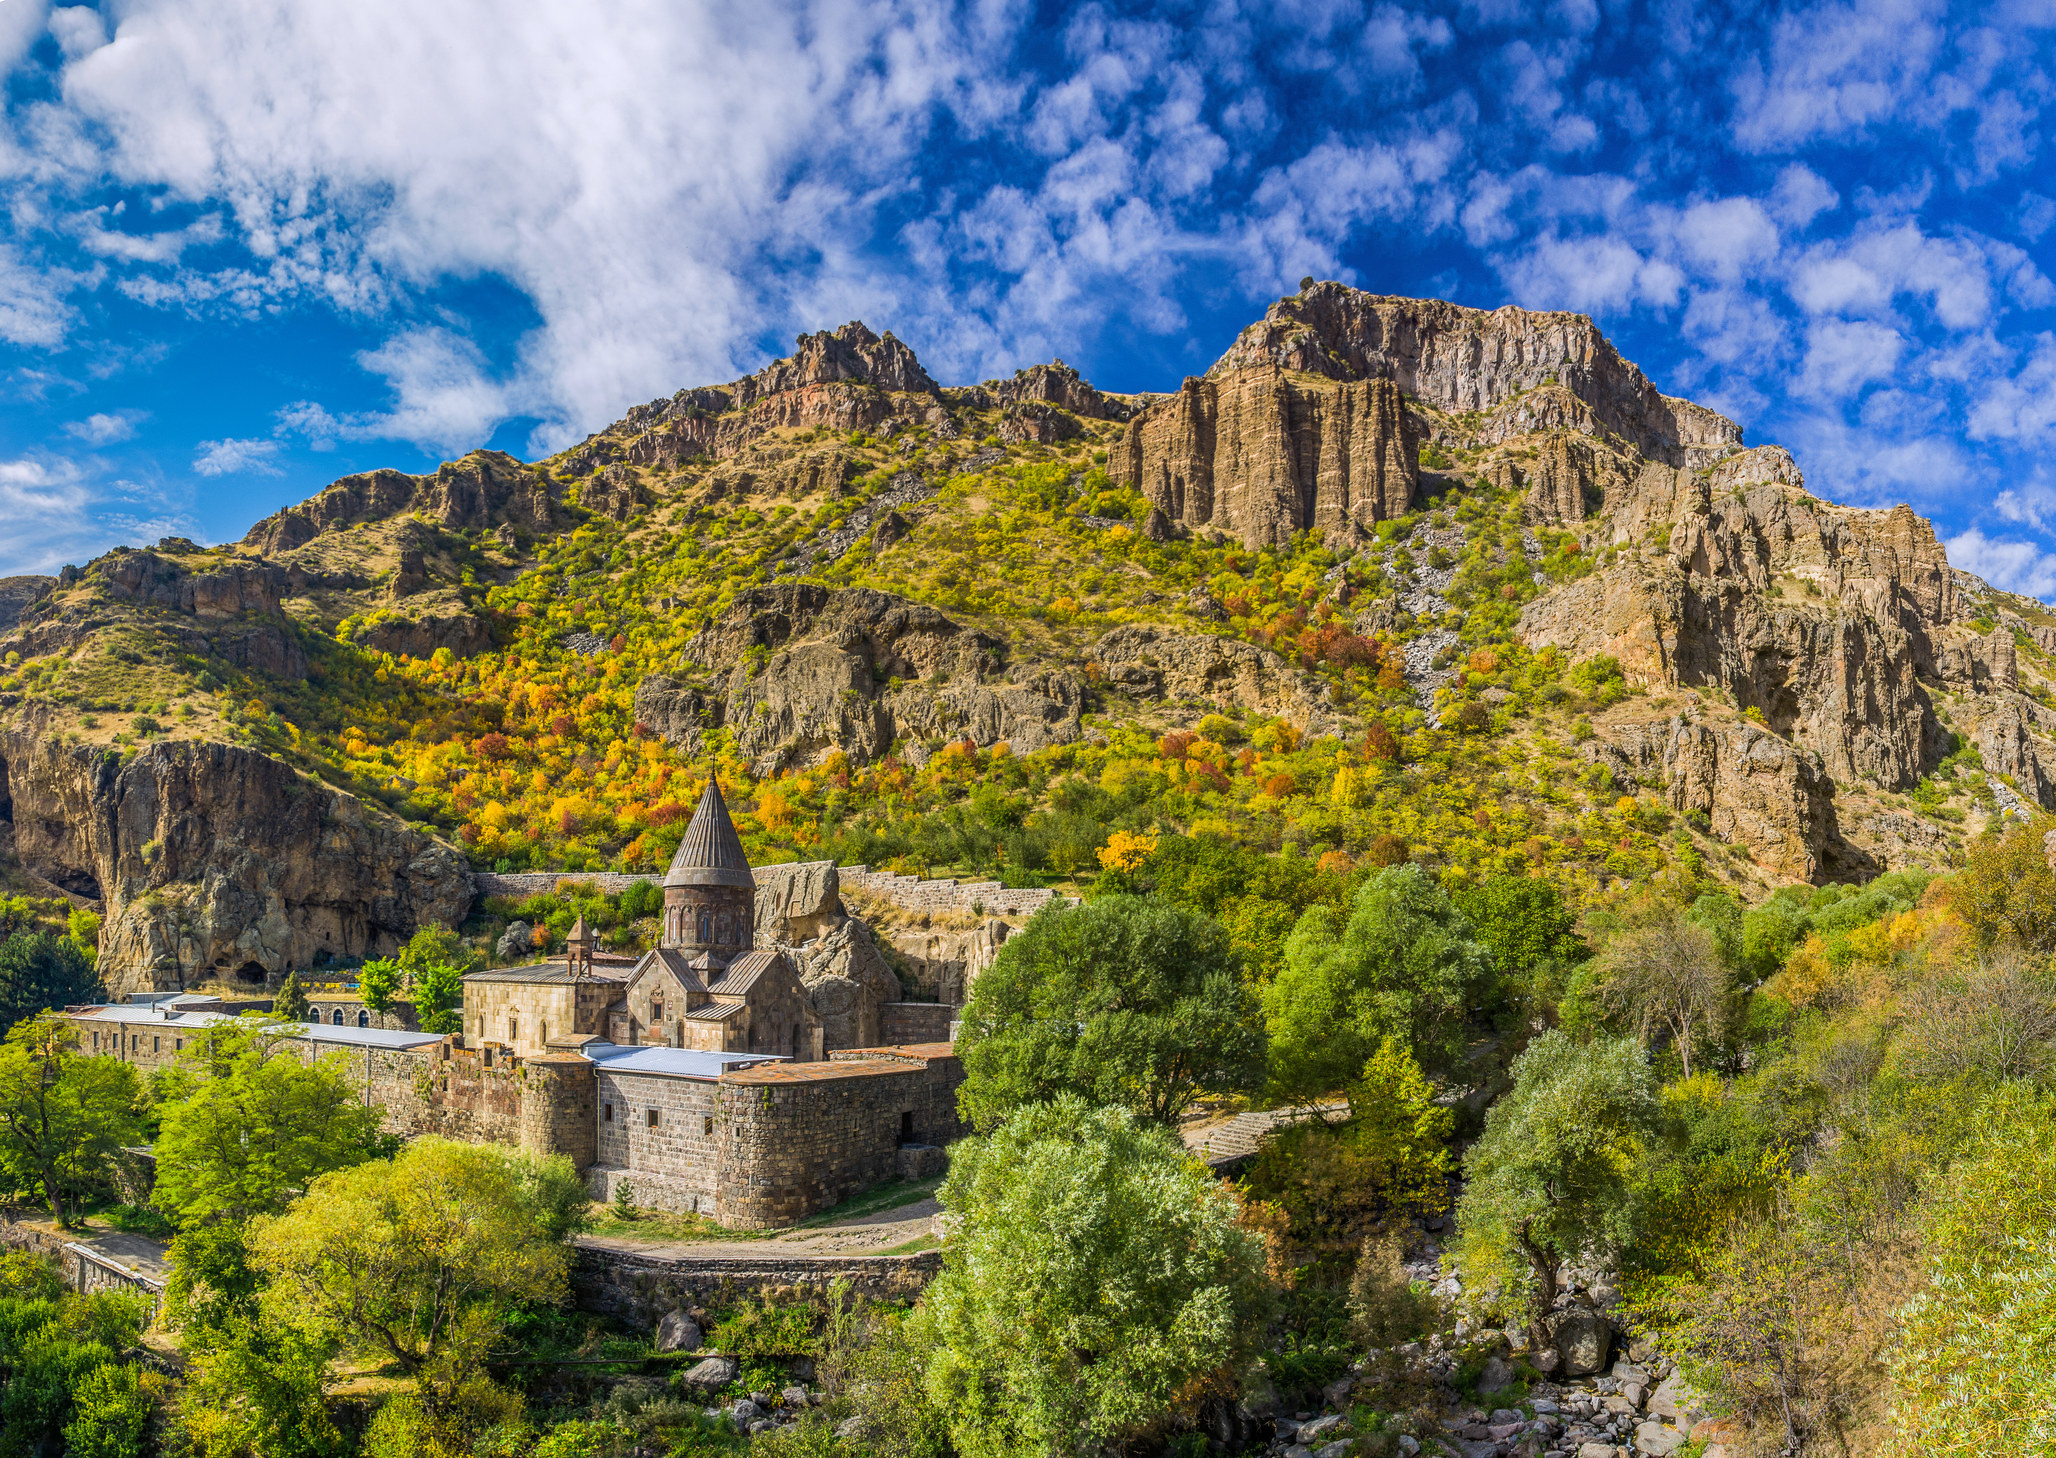 A monastery on a cliff in Armenia.